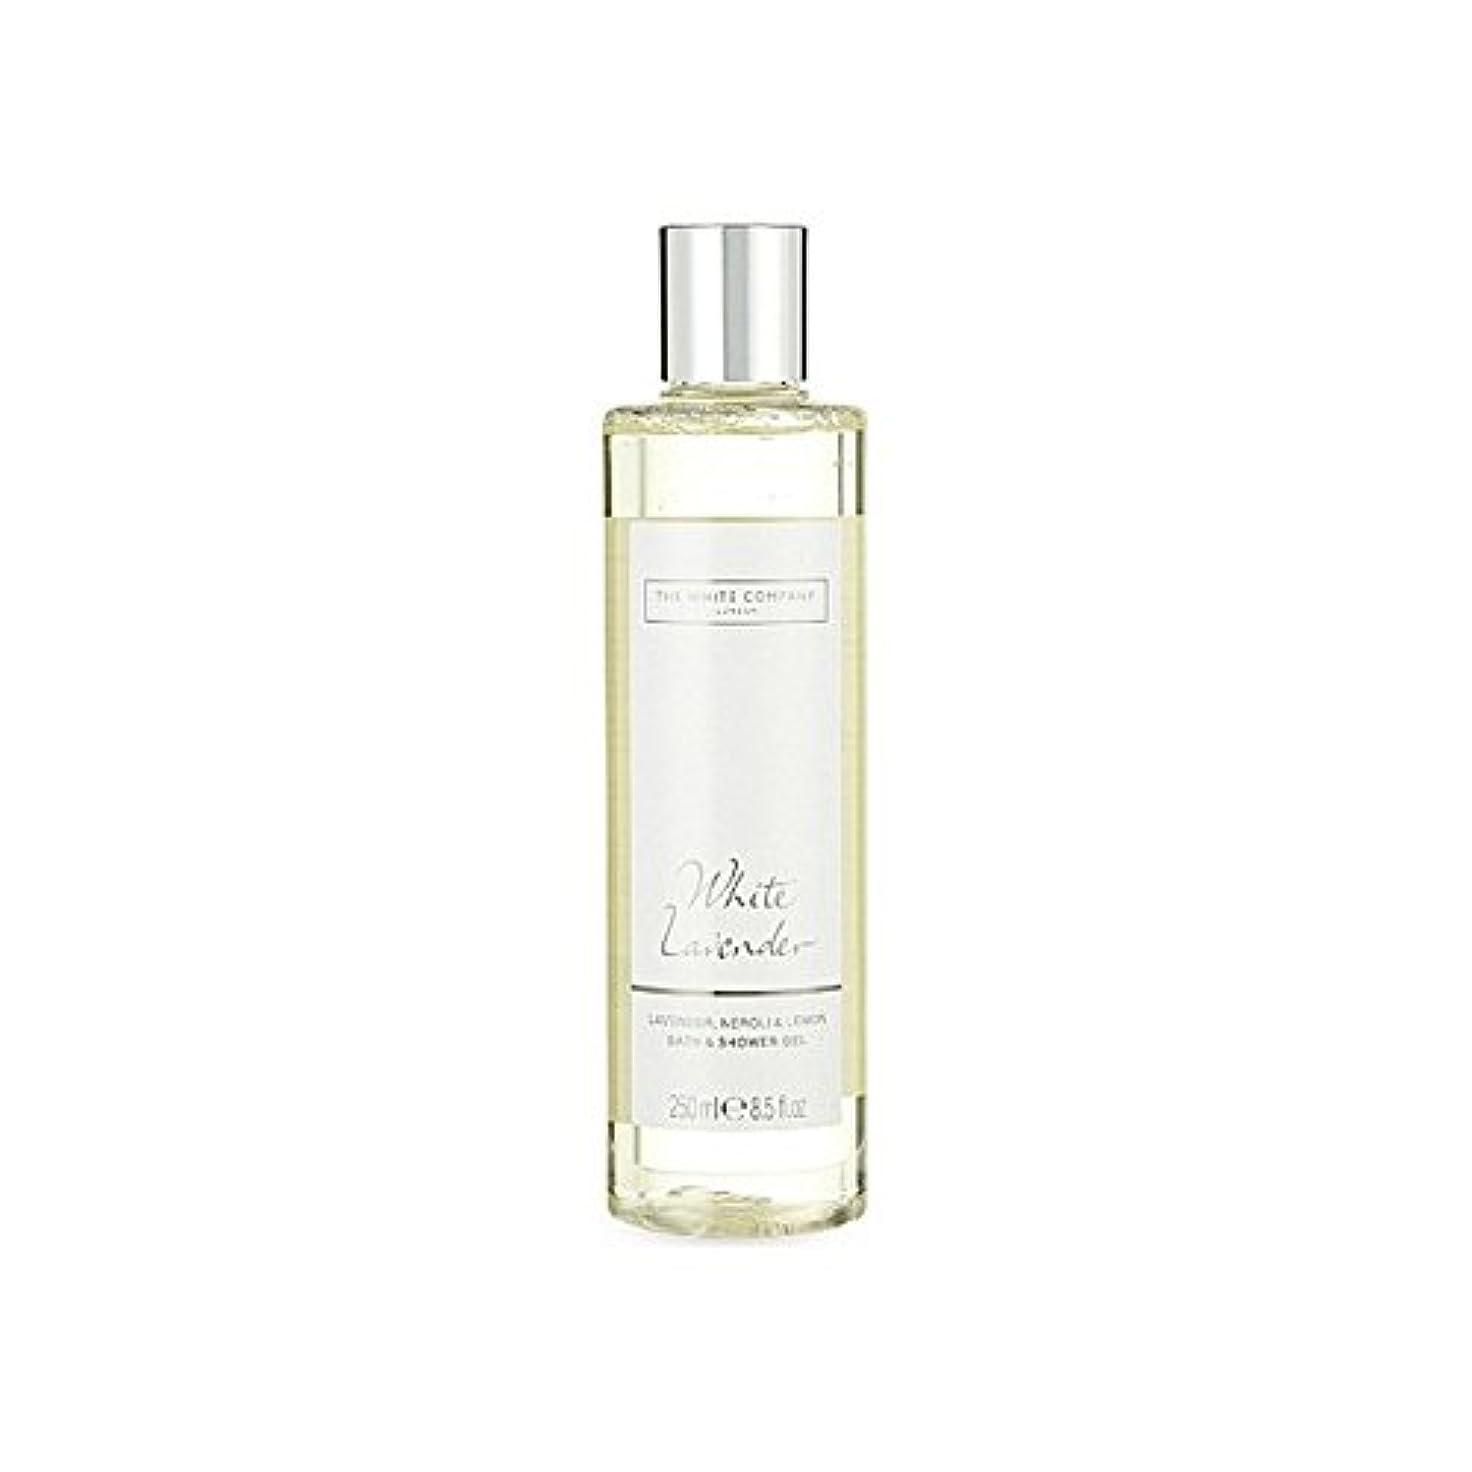 The White Company White Lavender Bath & Shower Gel - 白同社白ラベンダーのバス&シャワージェル [並行輸入品]